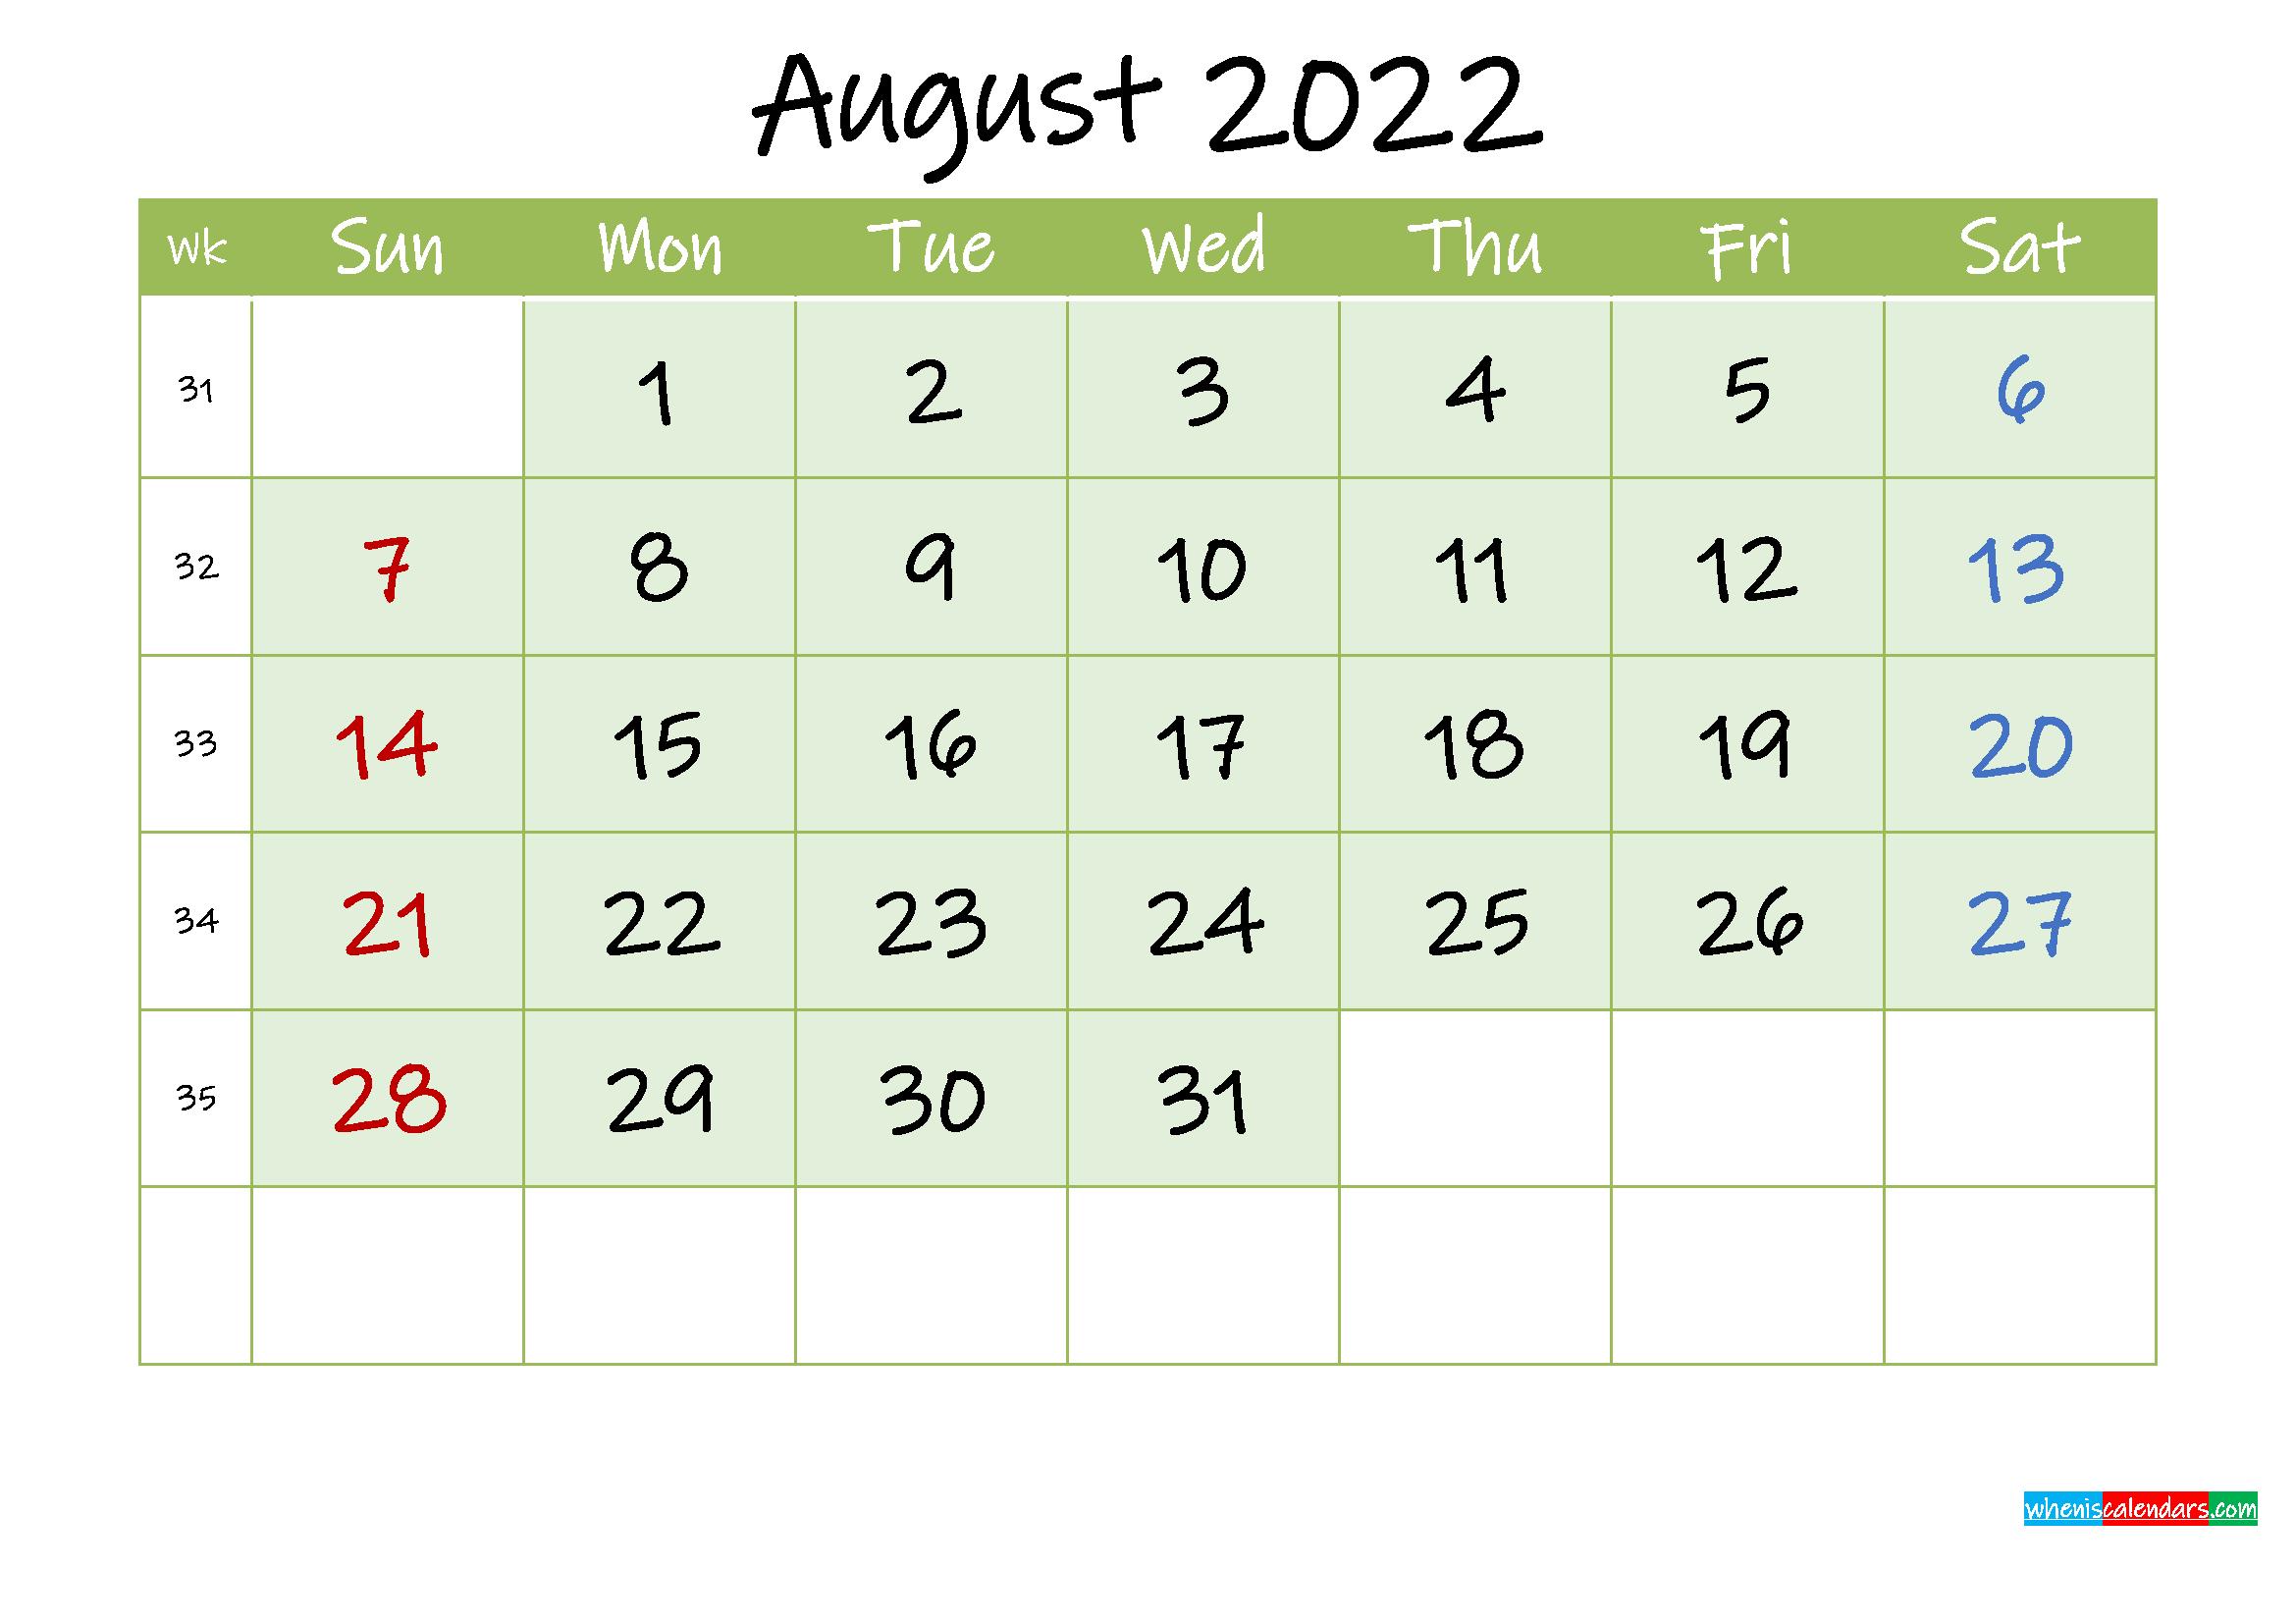 August 2022 Free Printable Calendar - Template ink22m128